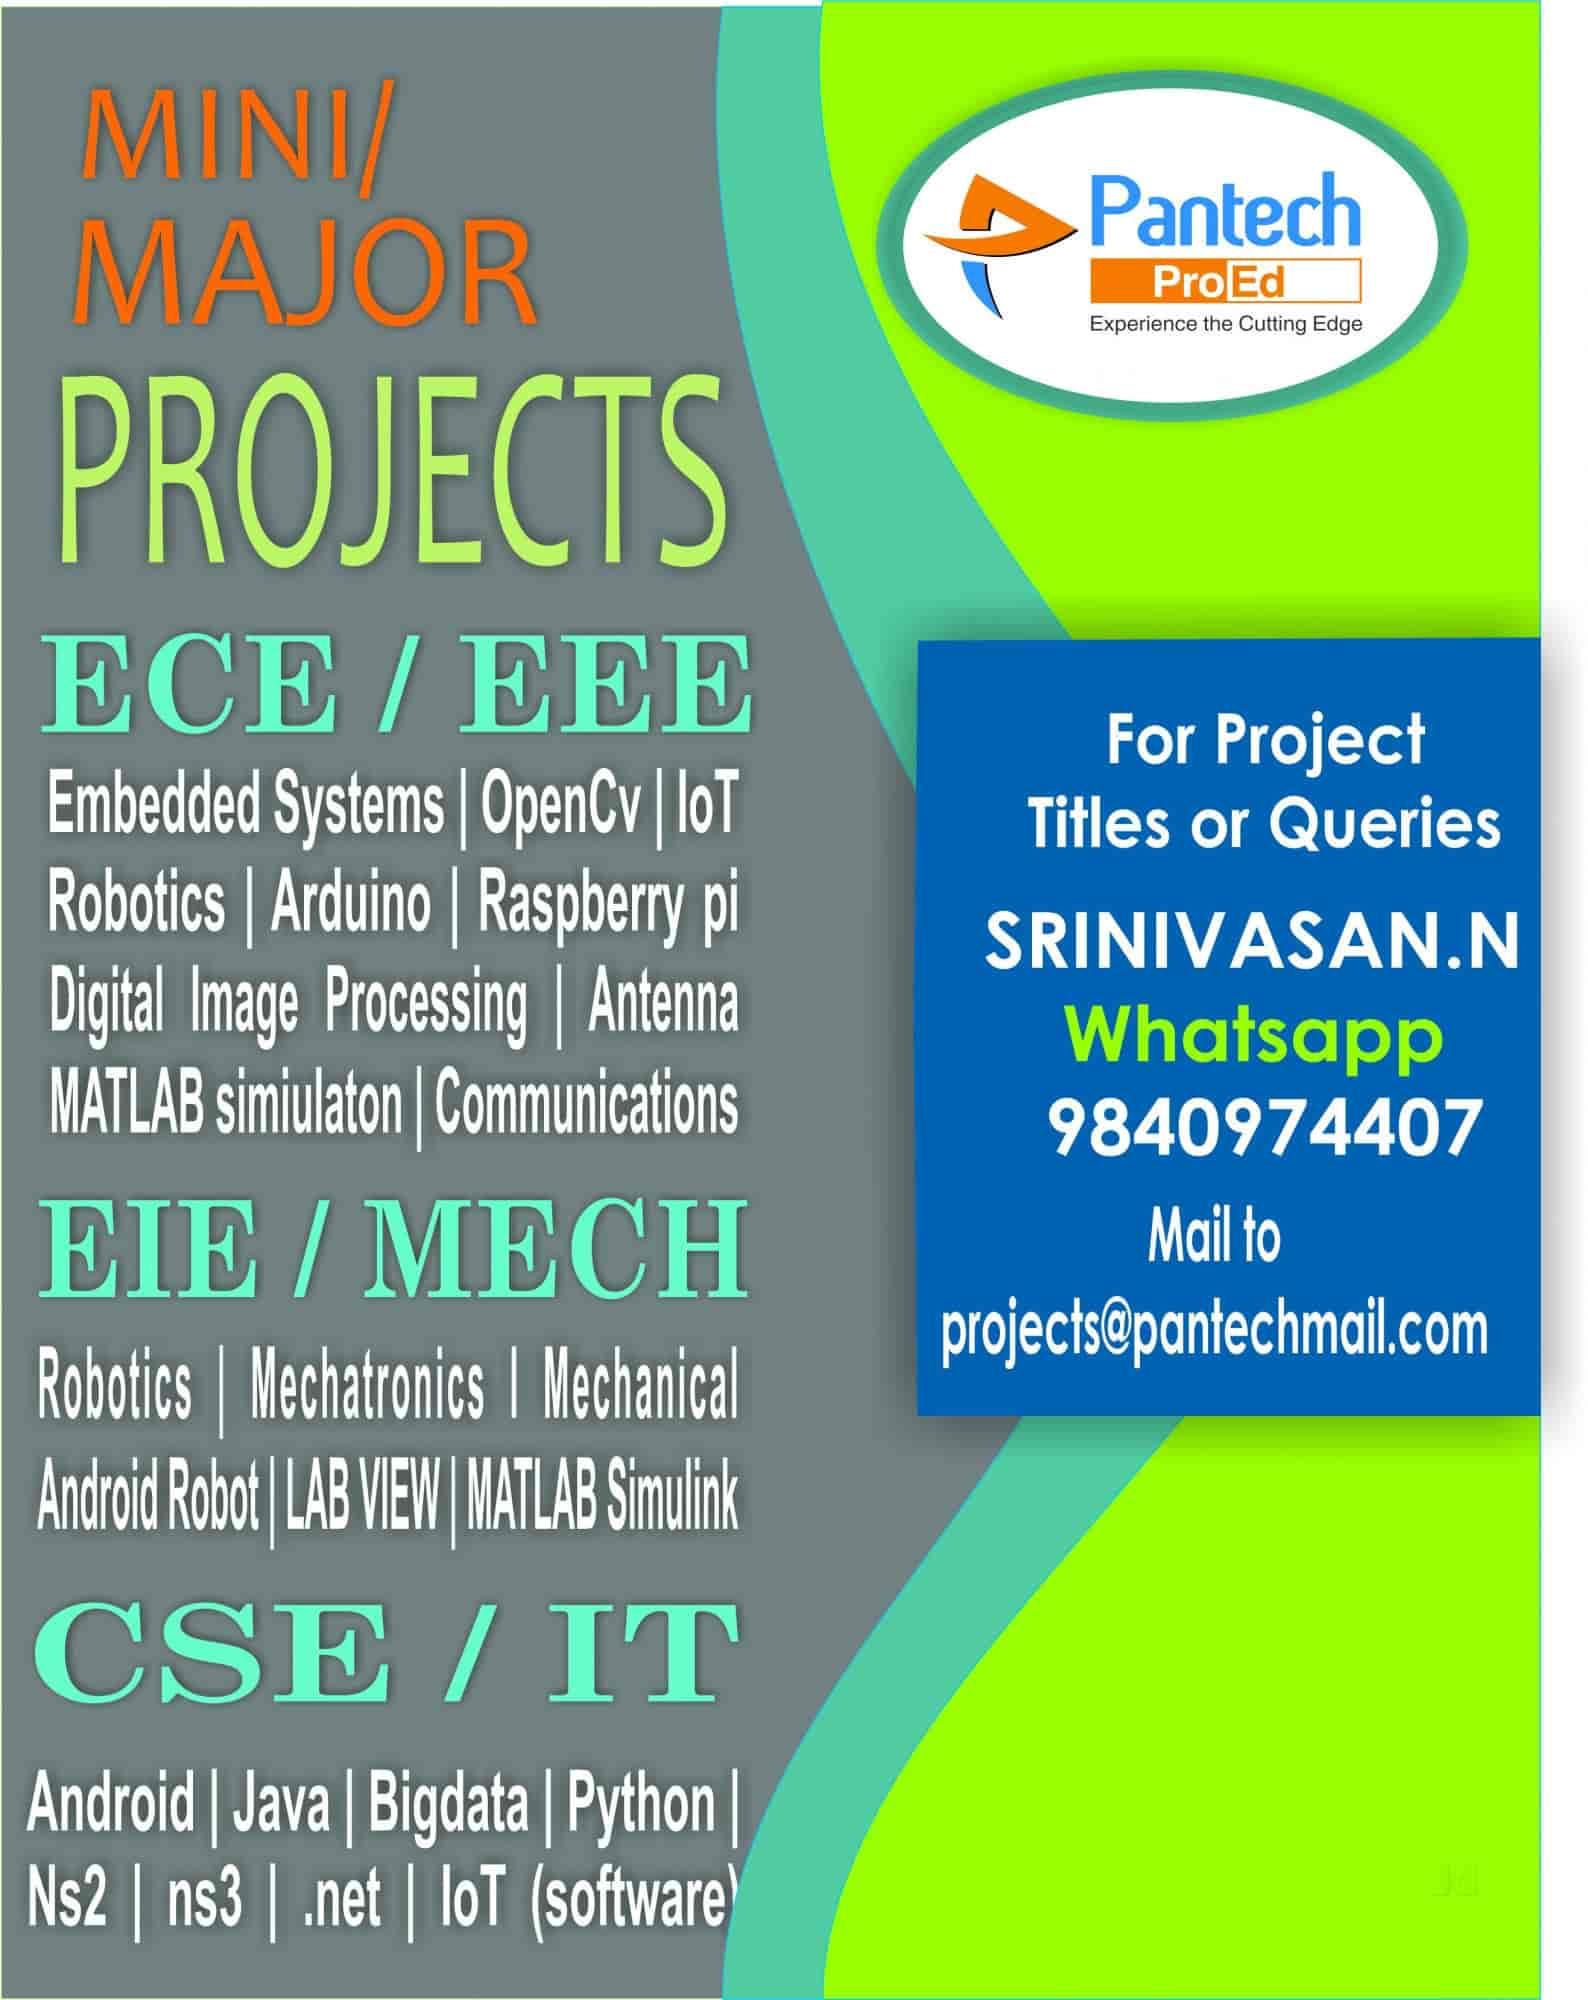 Pantech Proed Pvt Ltd, T Nagar - Computer Project Work in Chennai